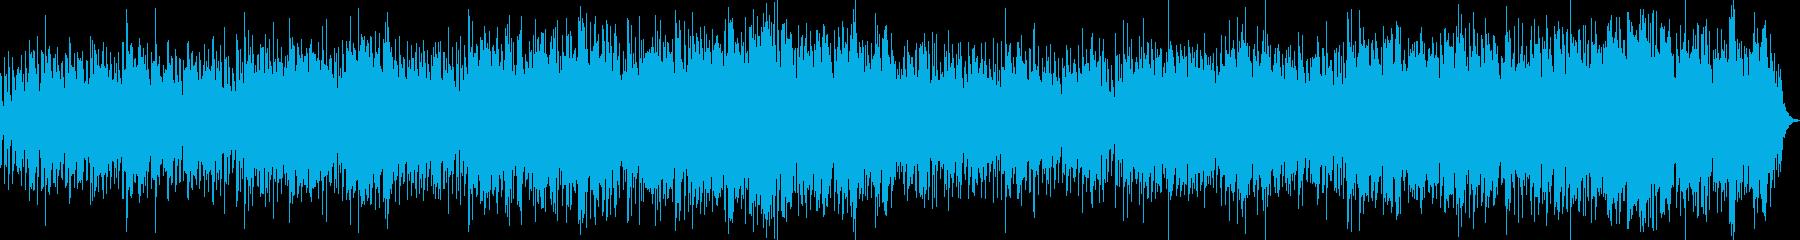 Japanese style healing bolero's reproduced waveform